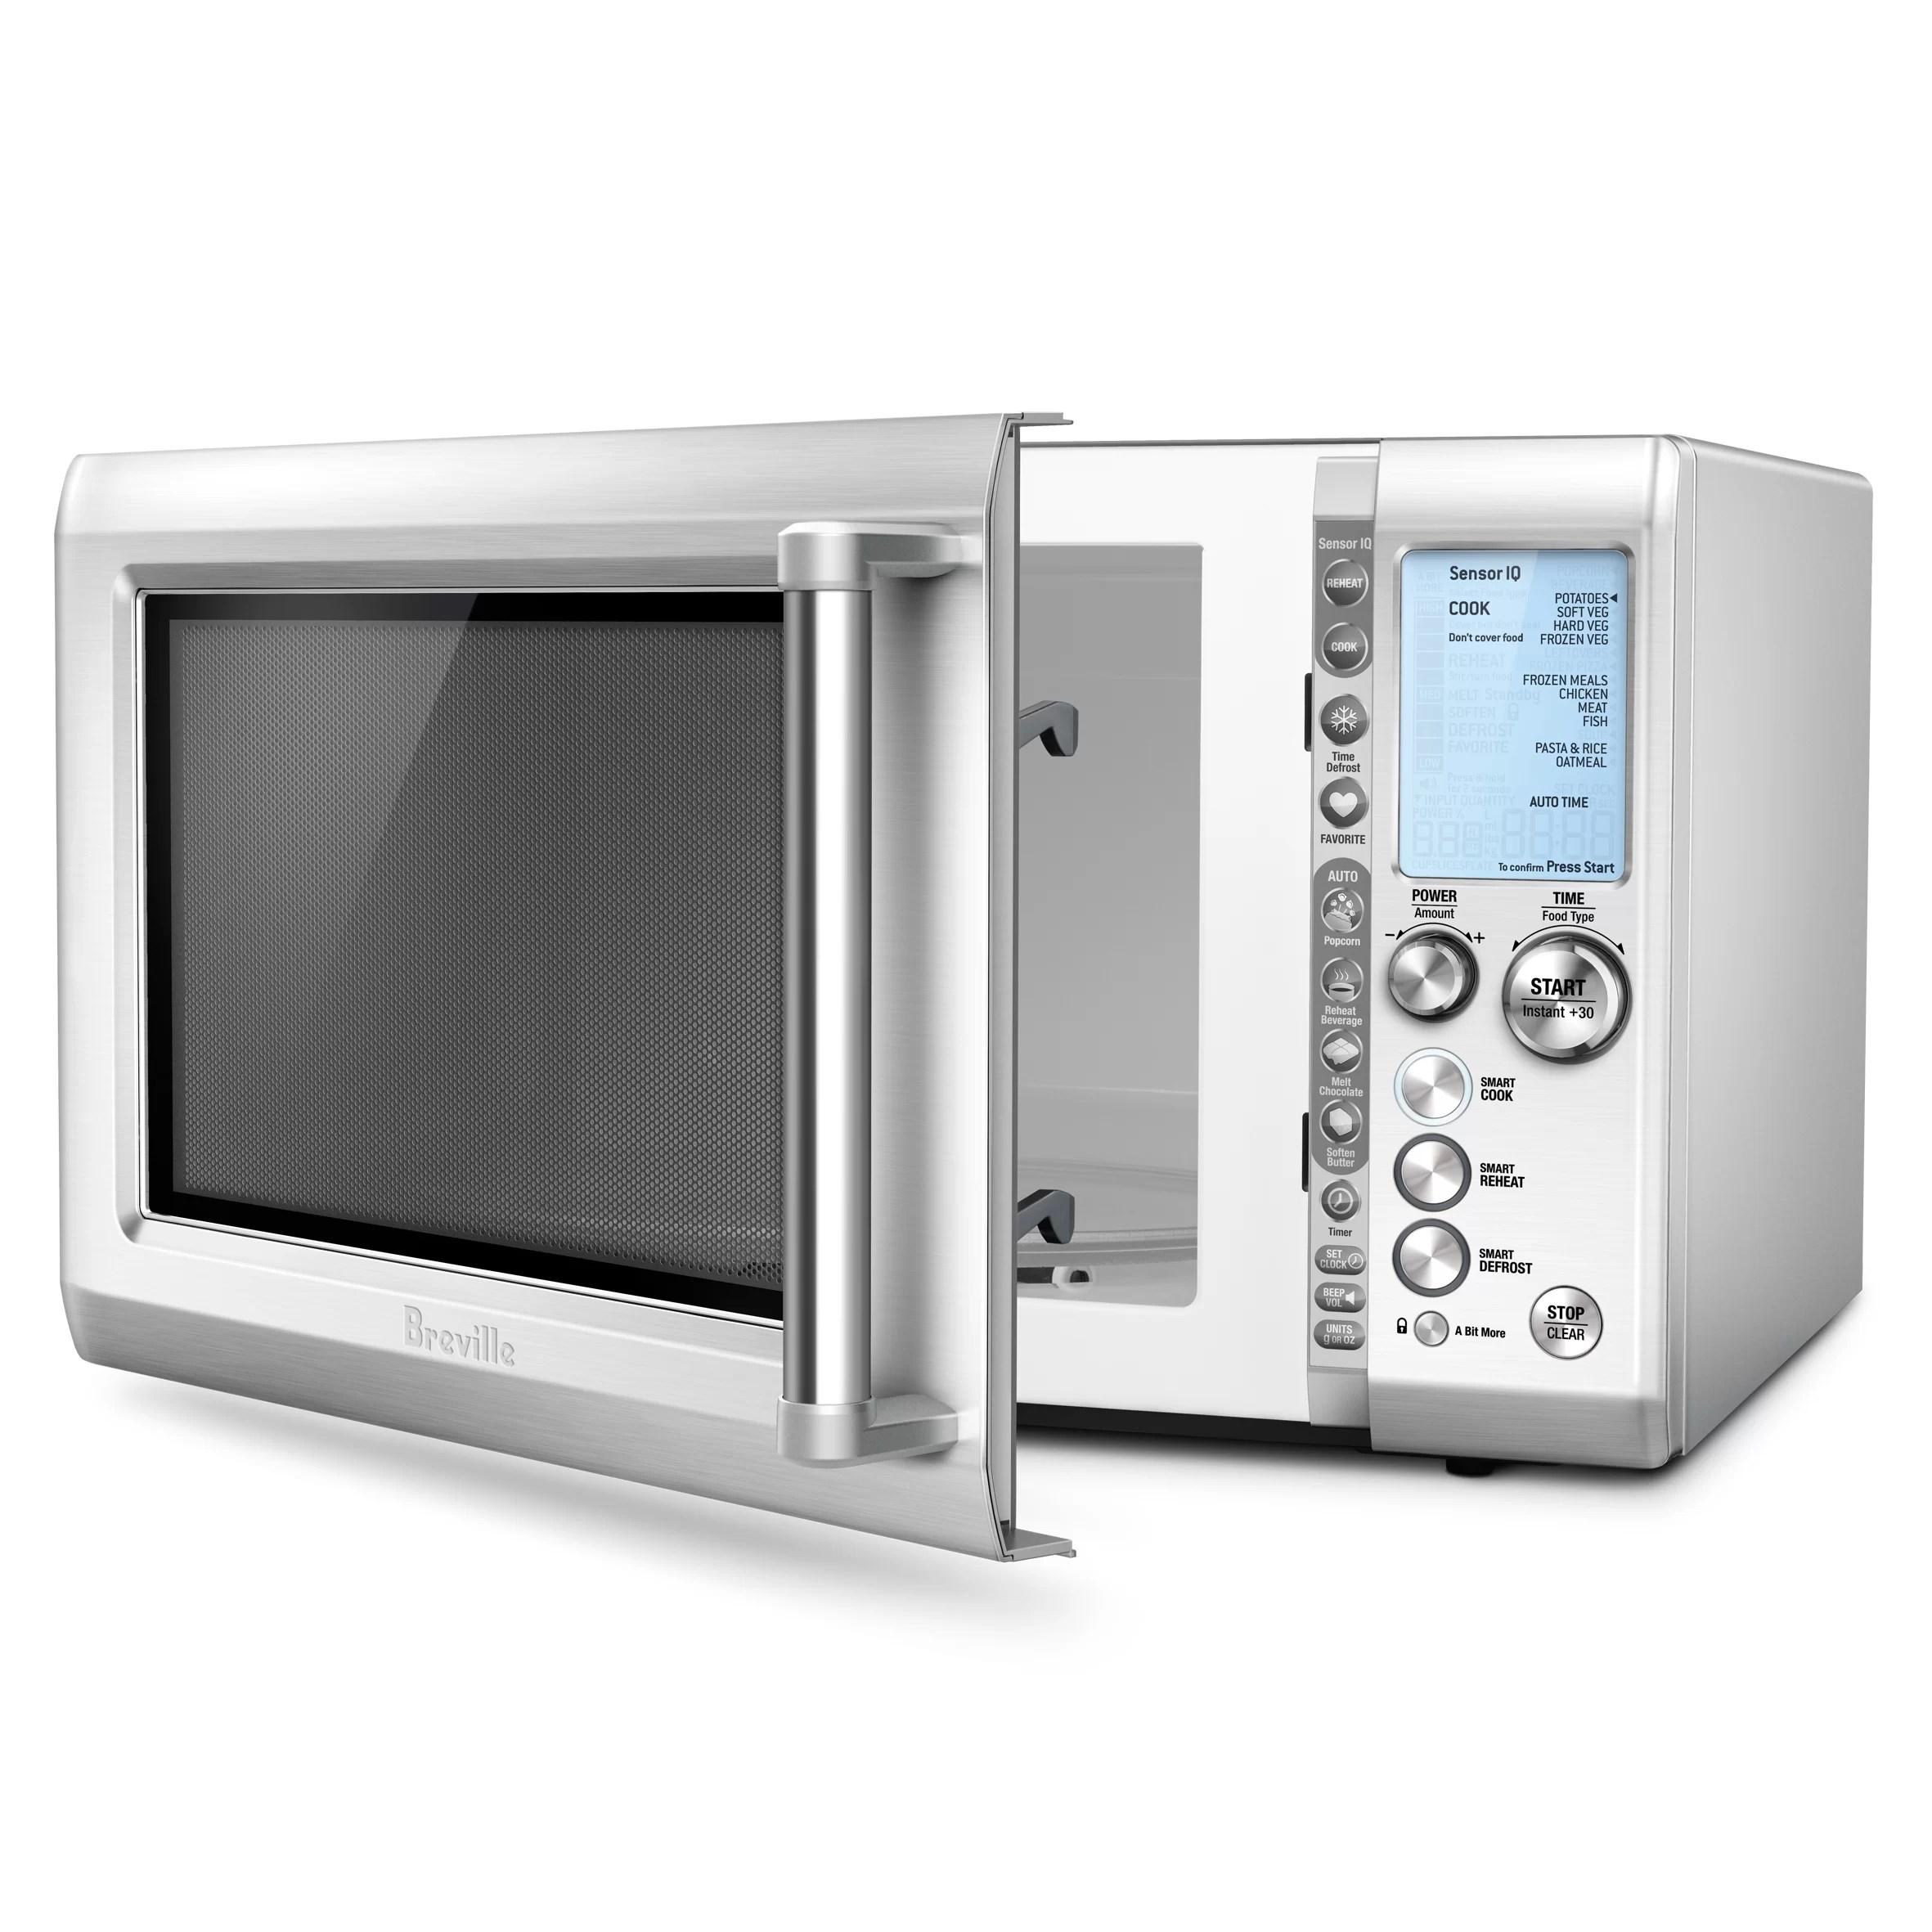 Breville 12 Cu Ft 1100W Microwave Amp Reviews Wayfair